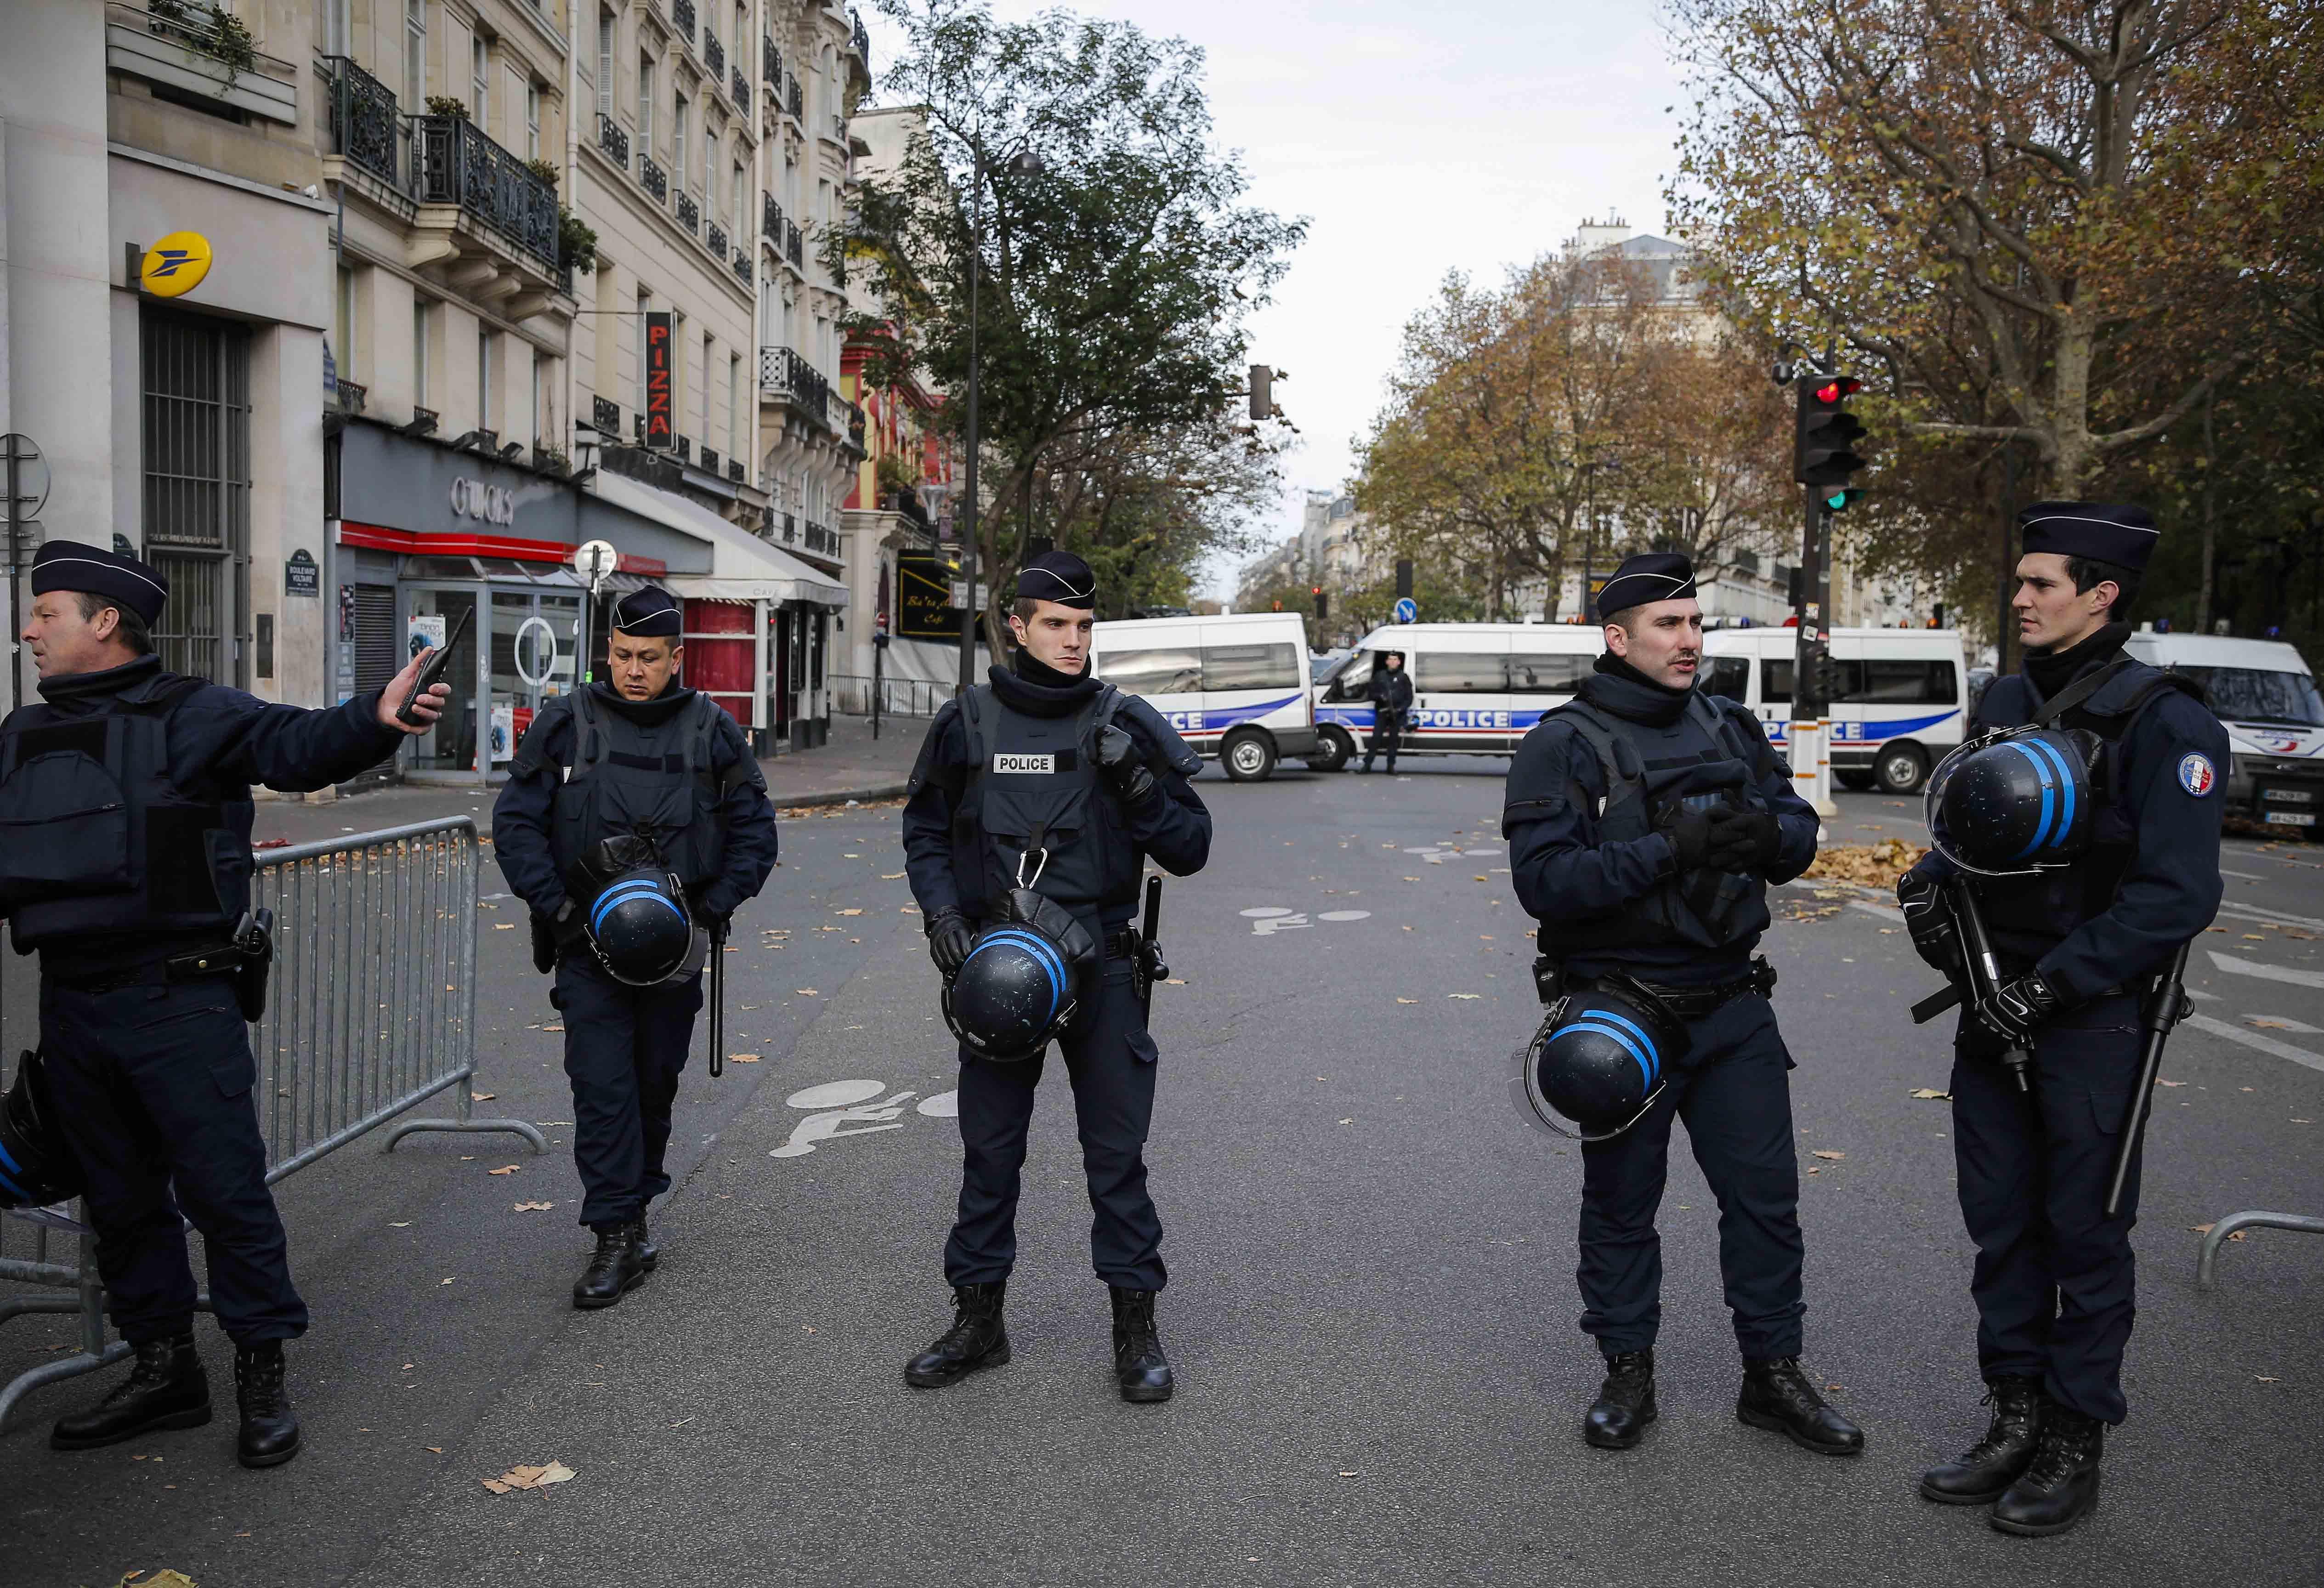 France : 129 morts et 352 blessés dans les attaques de vendredi